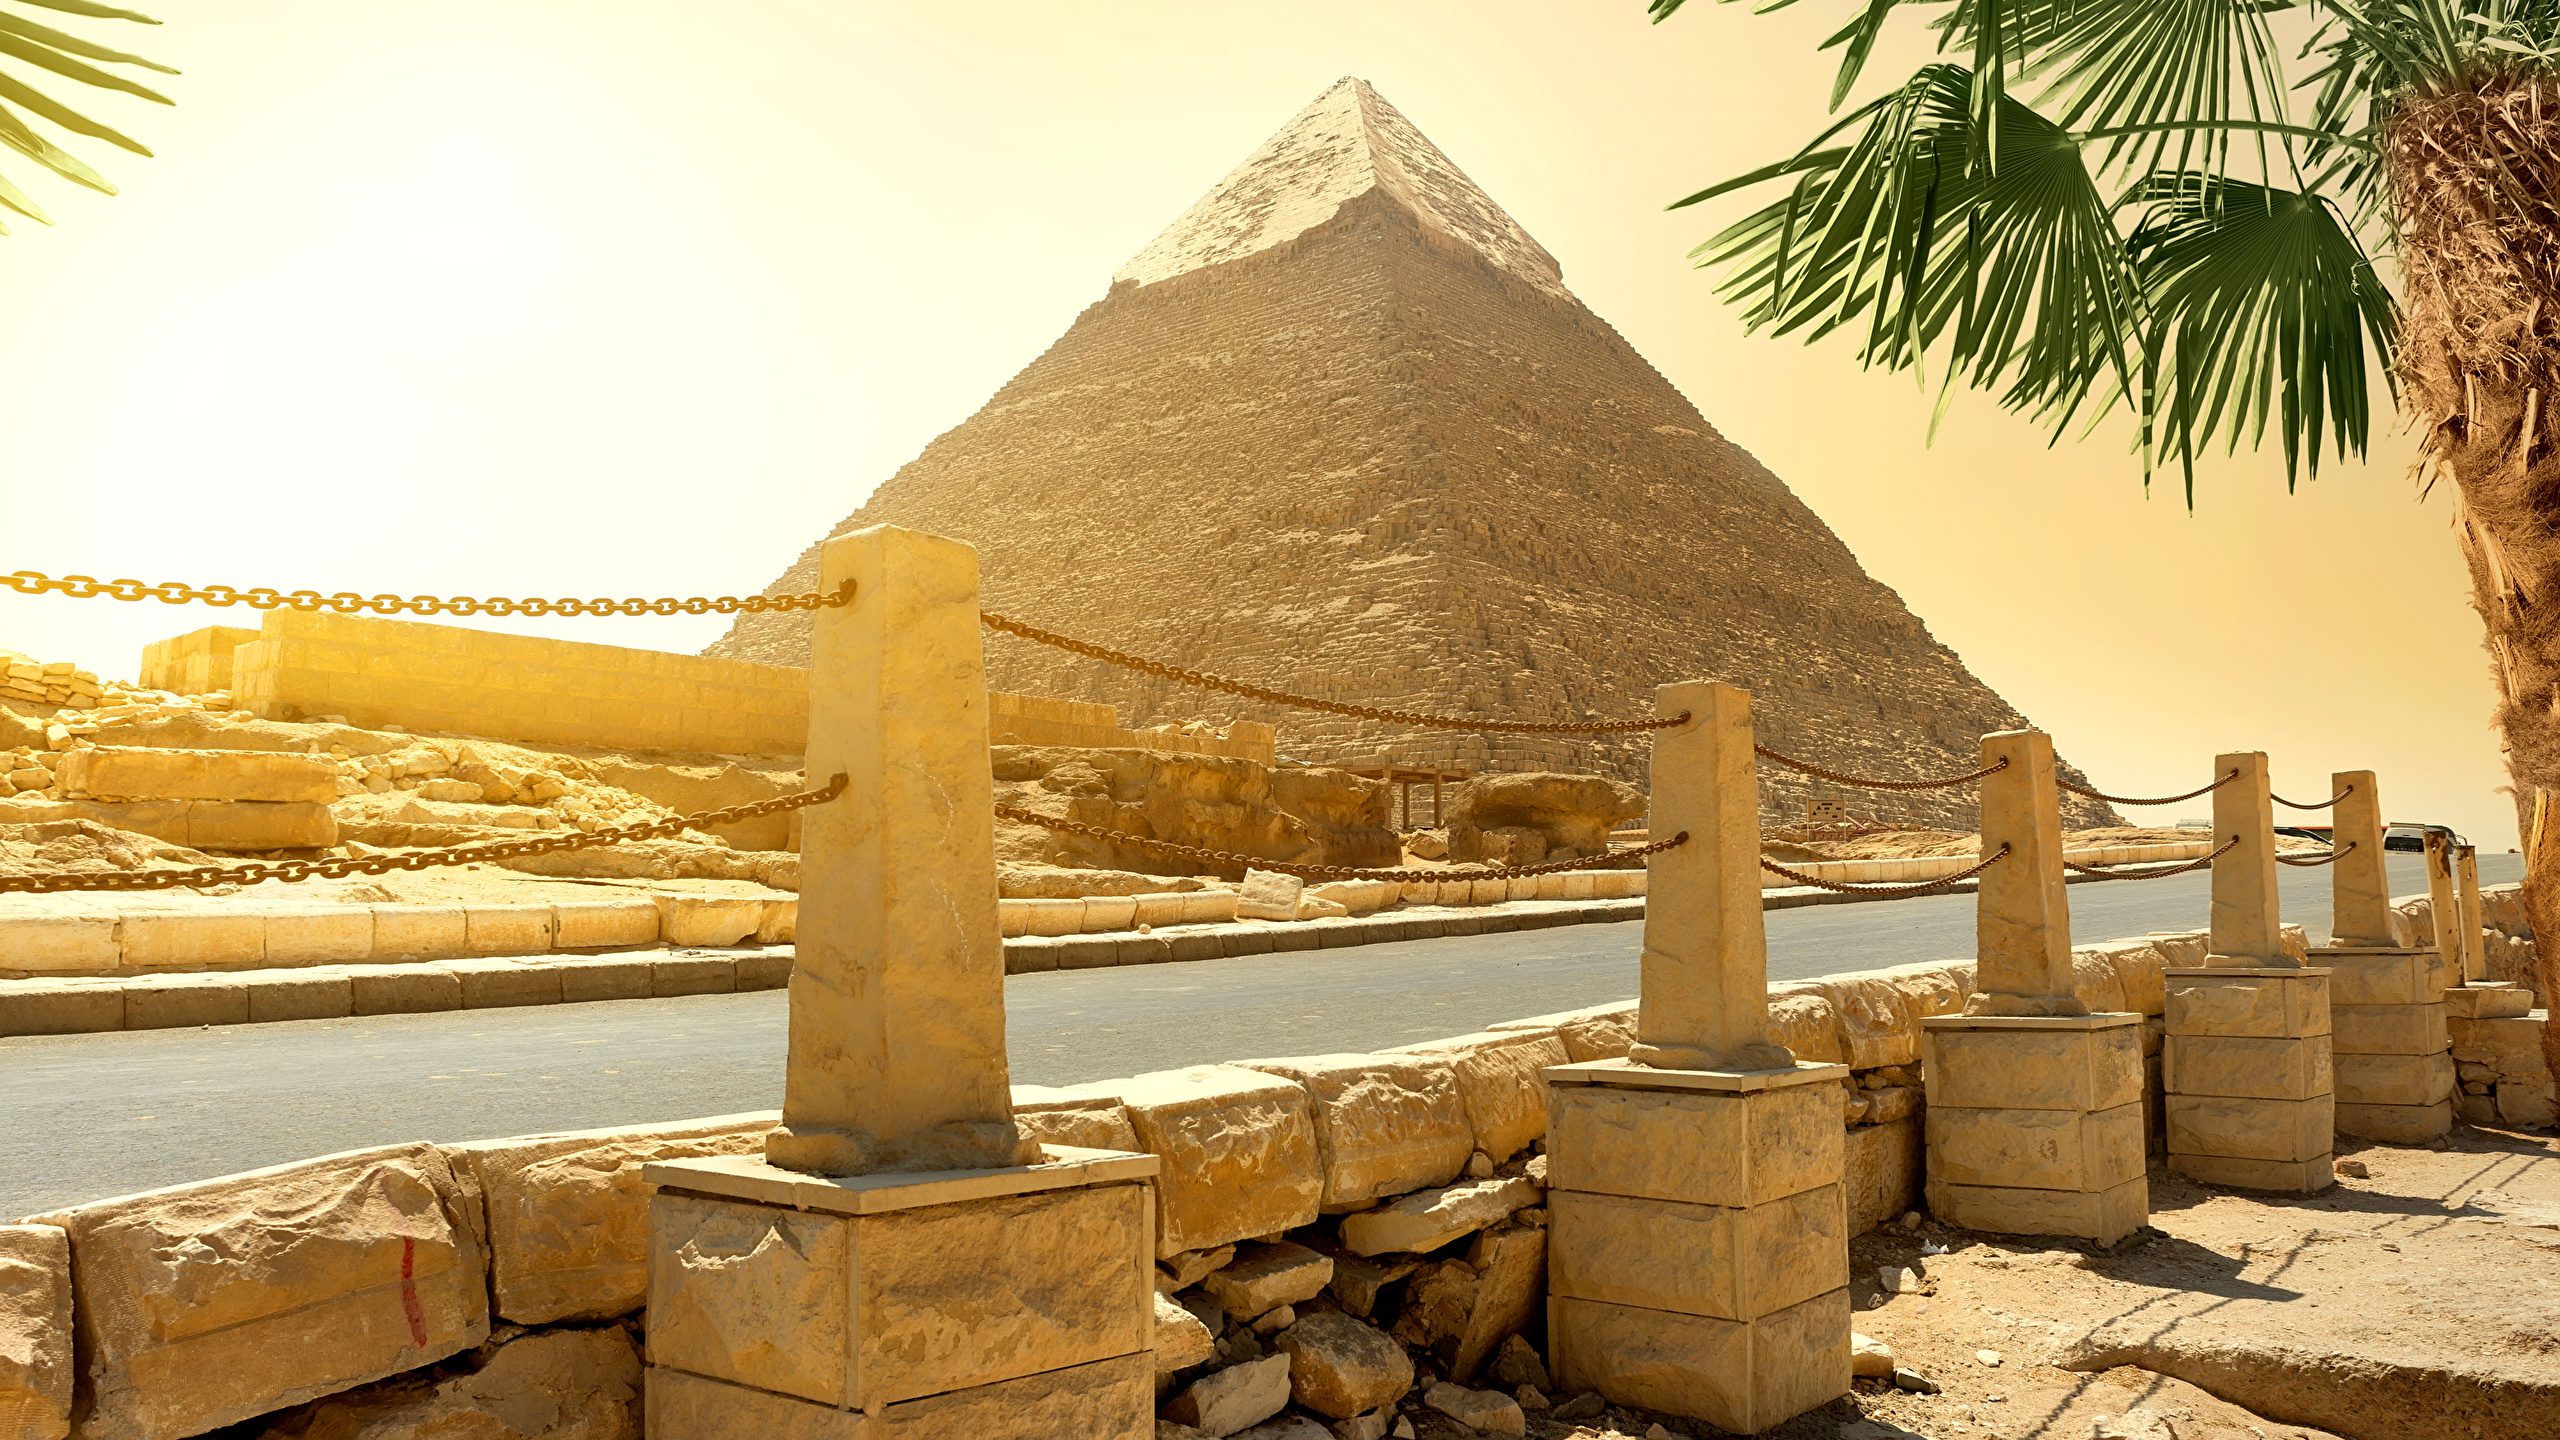 Egypt_Desert_Rivers_Stones_Cairo_Pyramid_523000_2560x1440